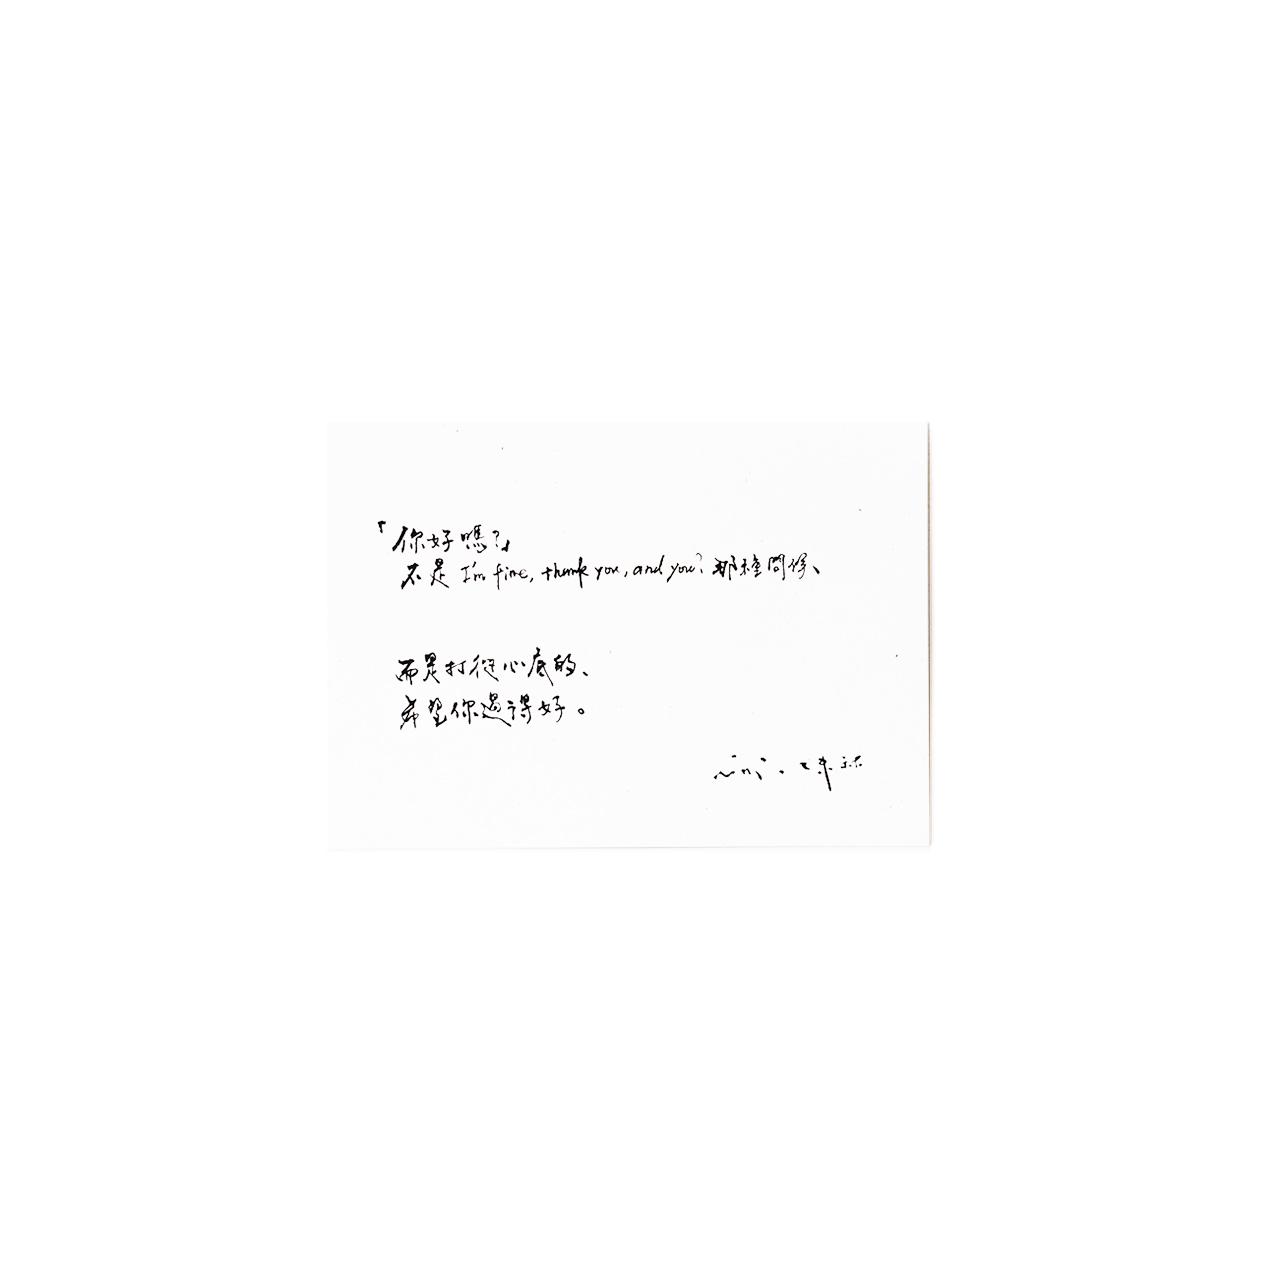 S__8724512.jpg